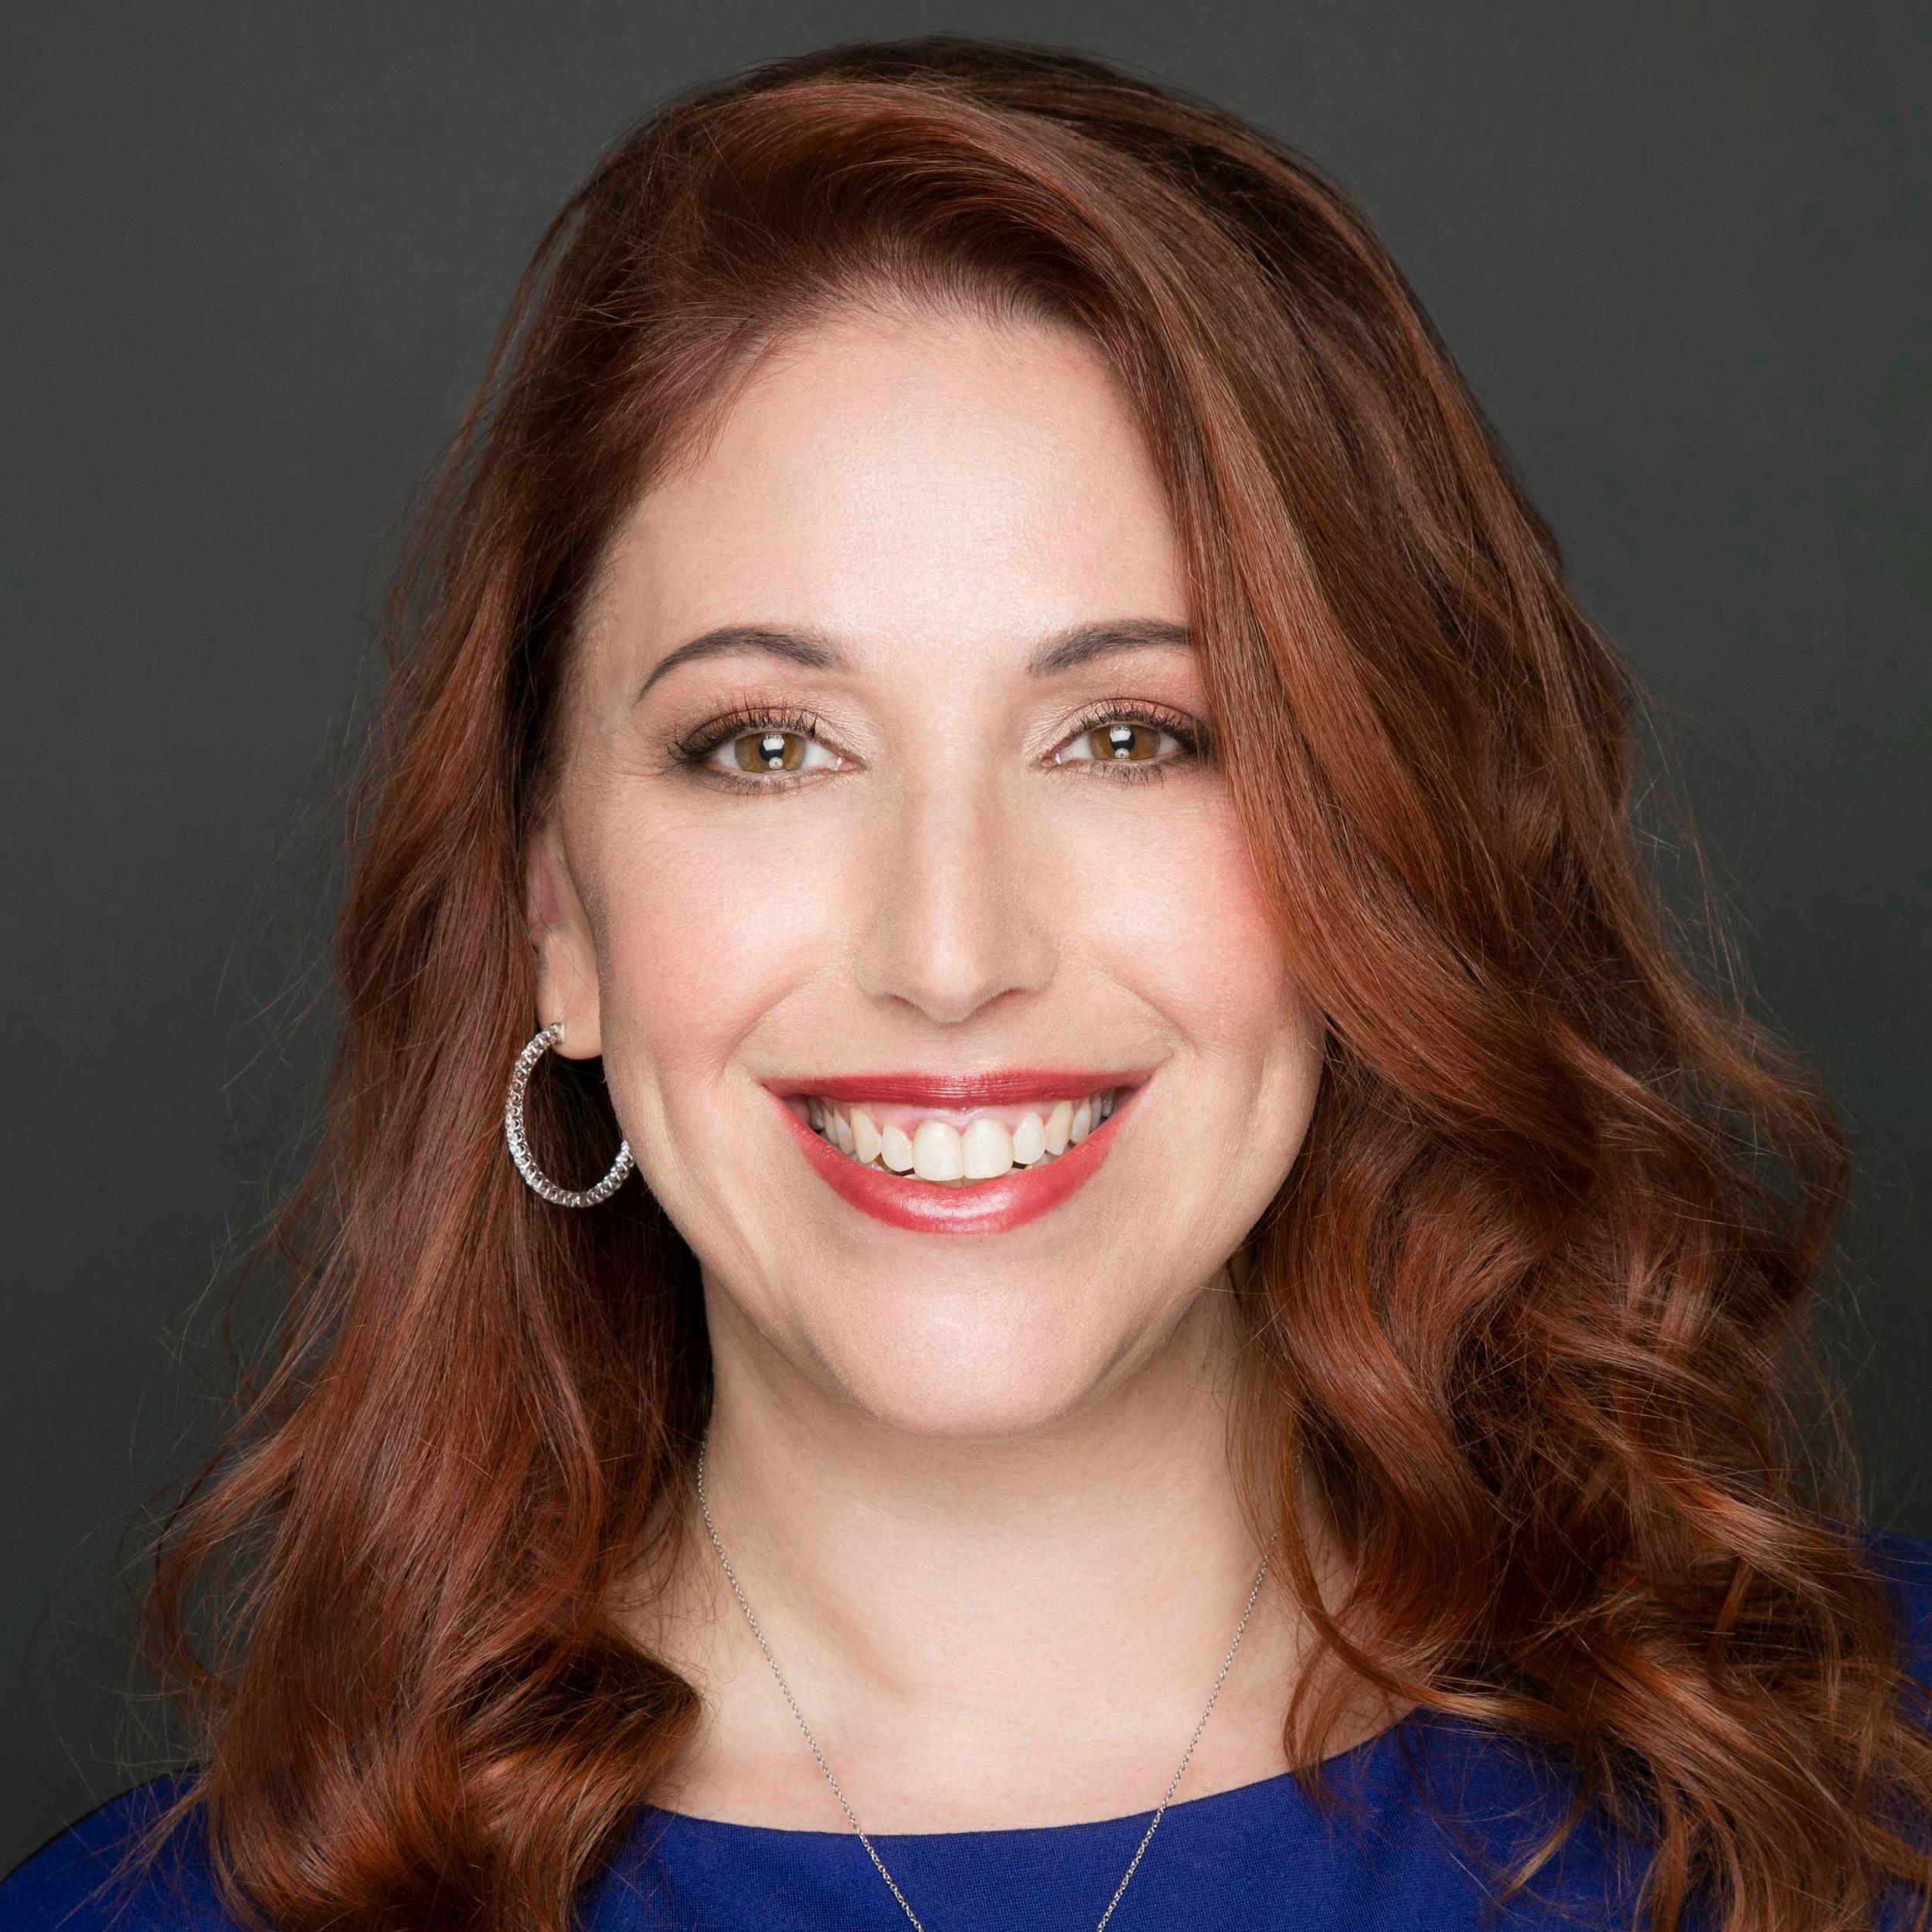 Rabbi Diana S. Gerson    Associate Executive Vice President of the New York Board of Rabbis (NYBR)